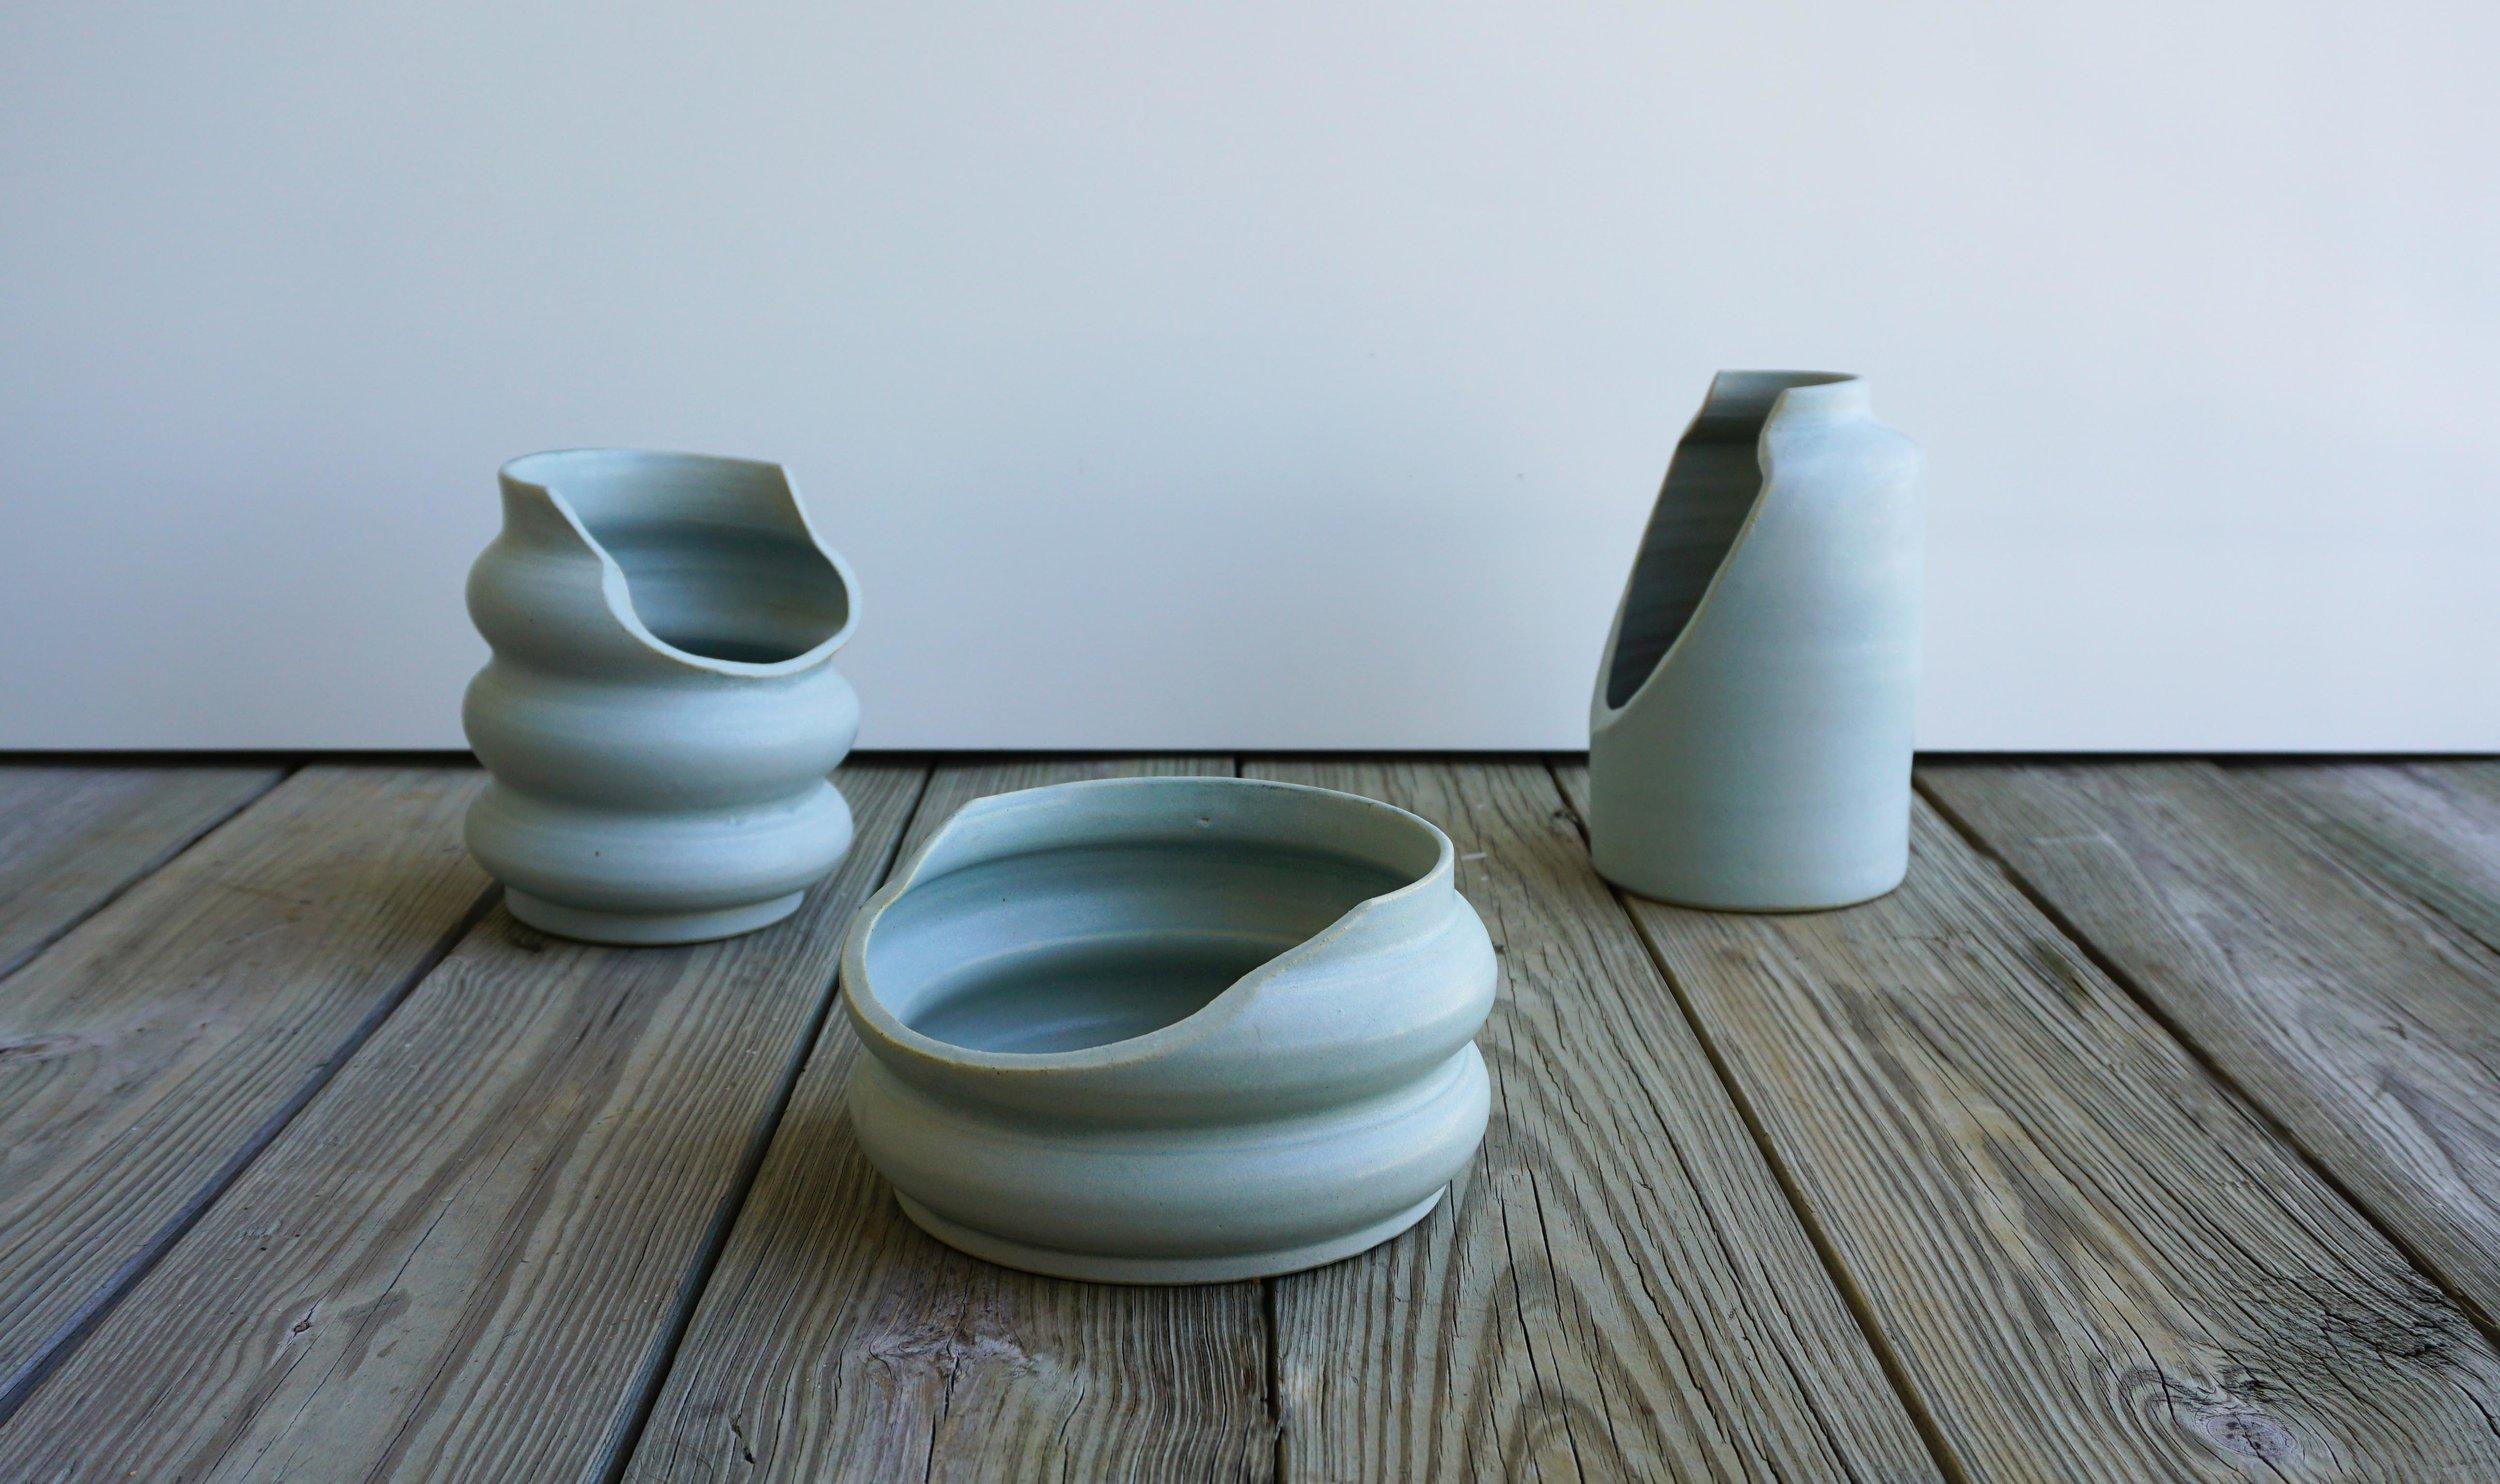 The  Compromise   collection of vessels by Bilge Nur Saltik